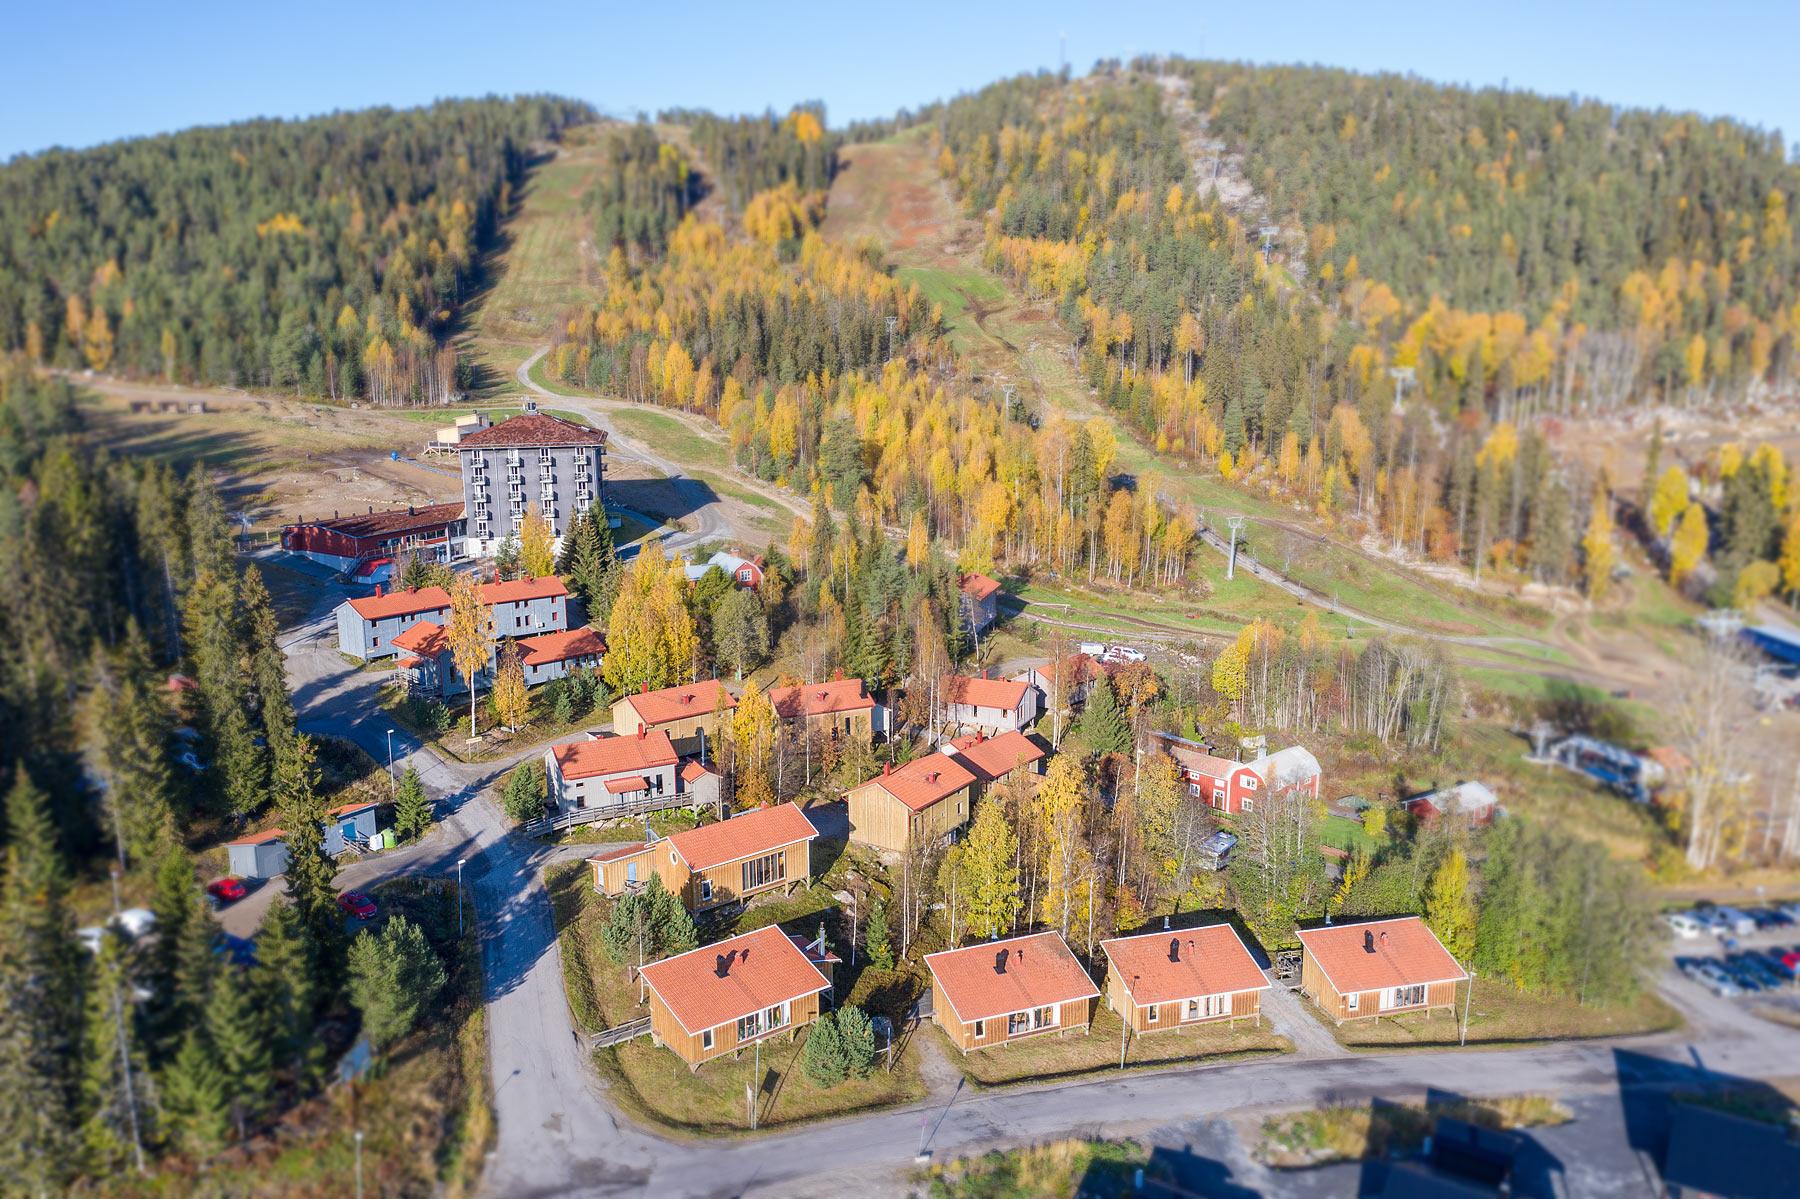 Järvsö Stugby - boende med ski in ski out-läge på Järvsö syd